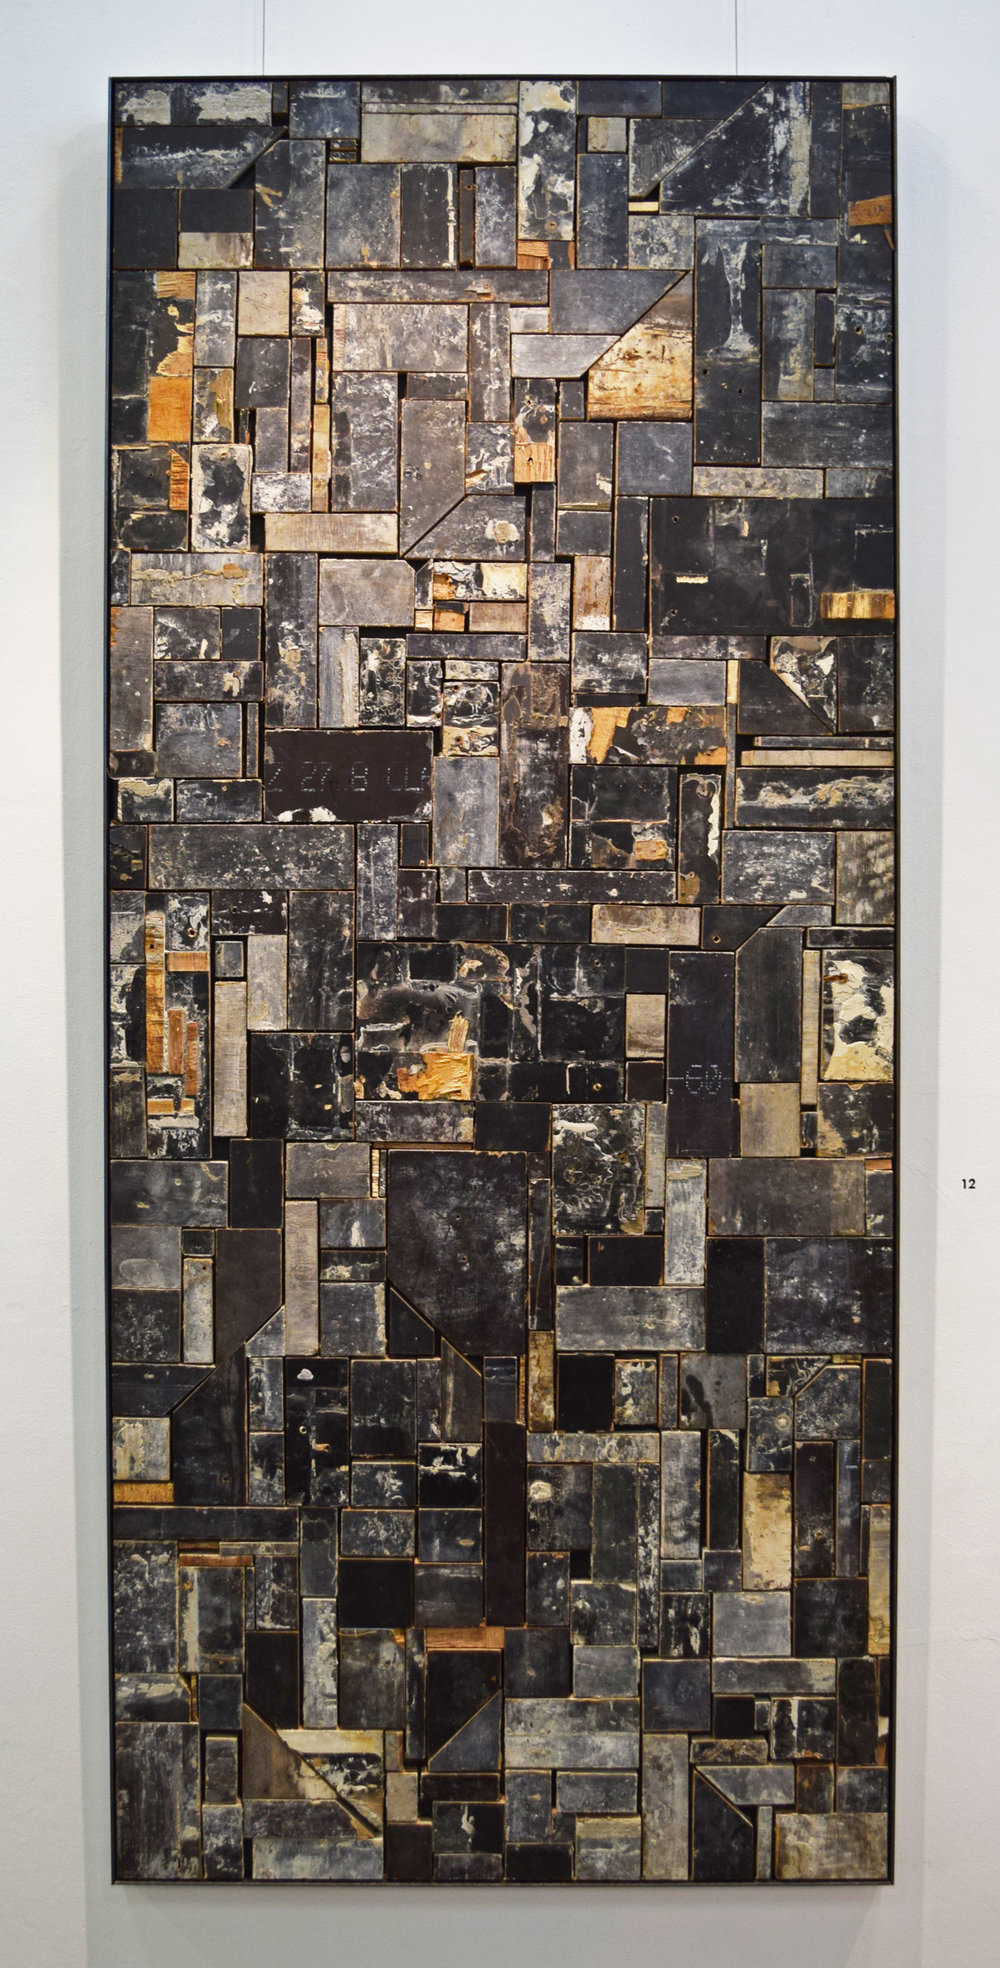 12. William Leggett,  Interminable Form 2,  2018, plywood, 182 x 40 cm $1,650